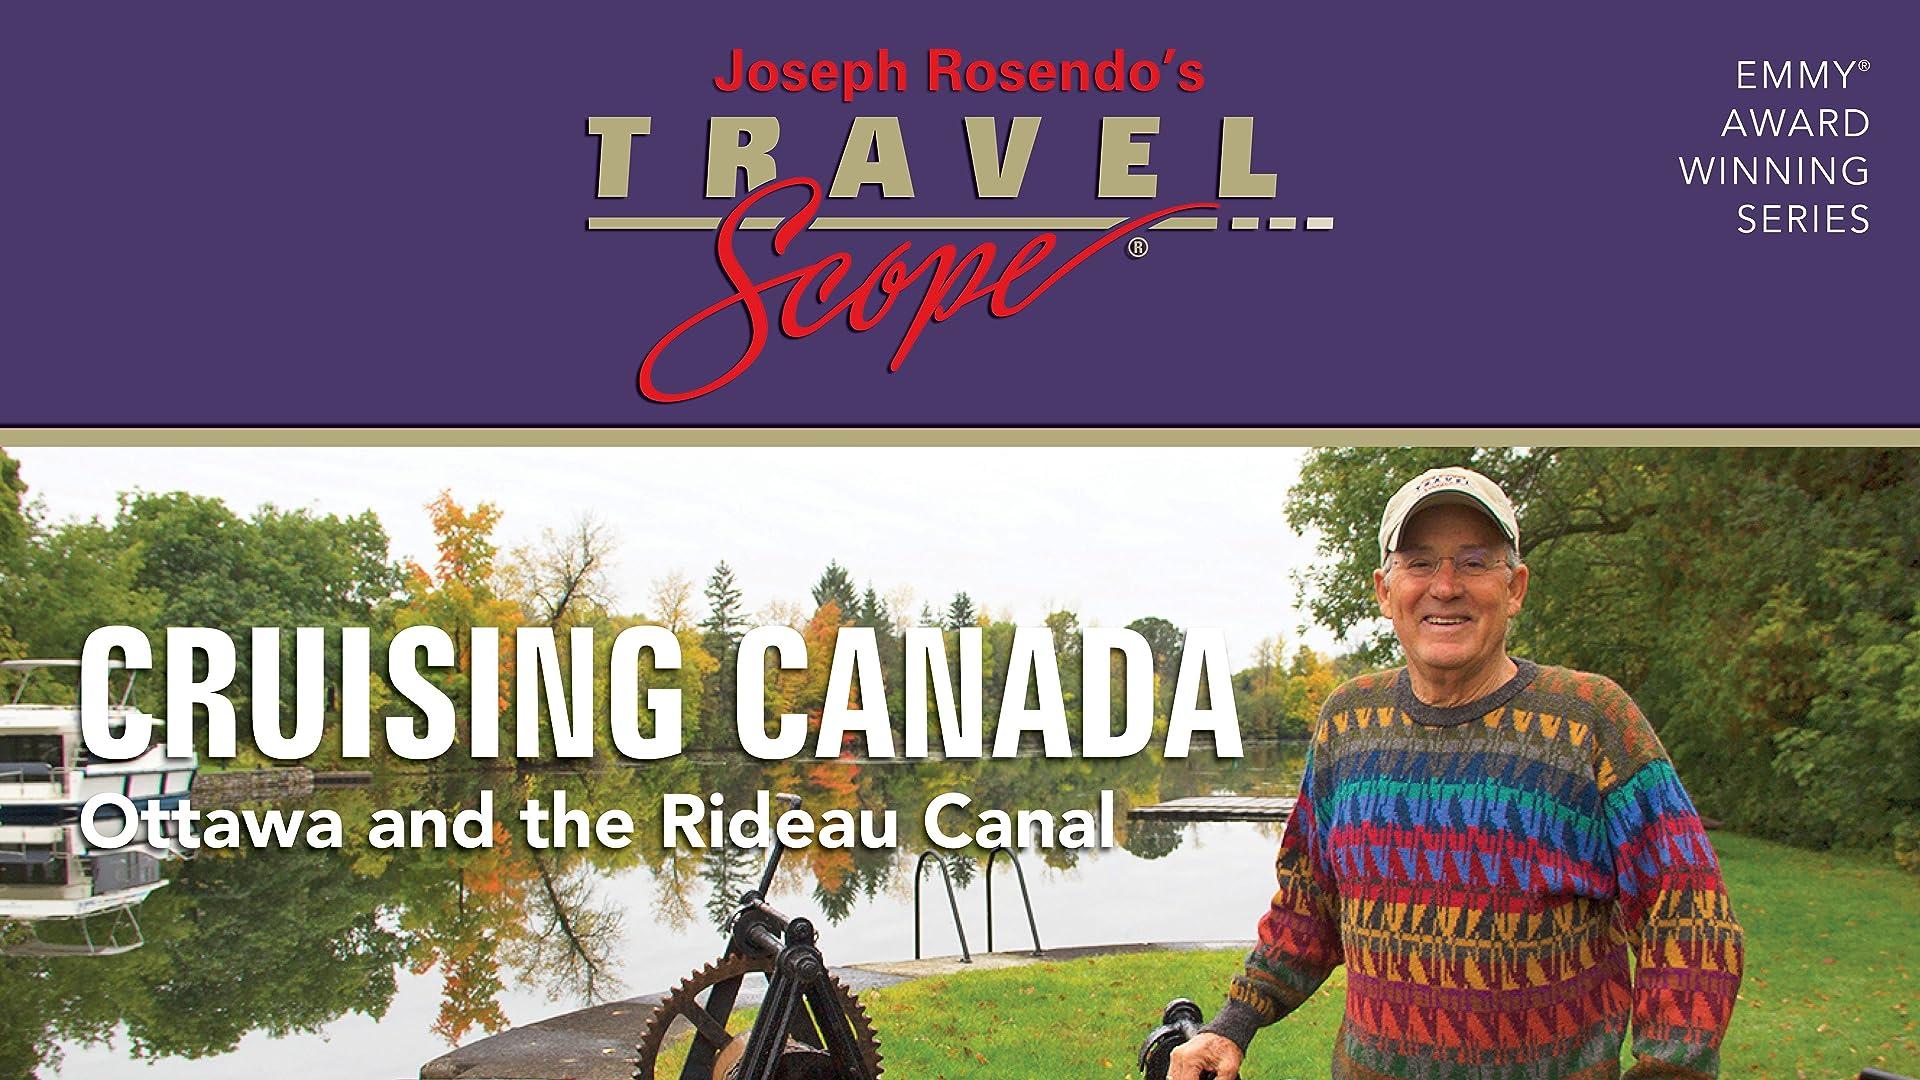 Cruising Canada: Ottawa and the Rideau Canal